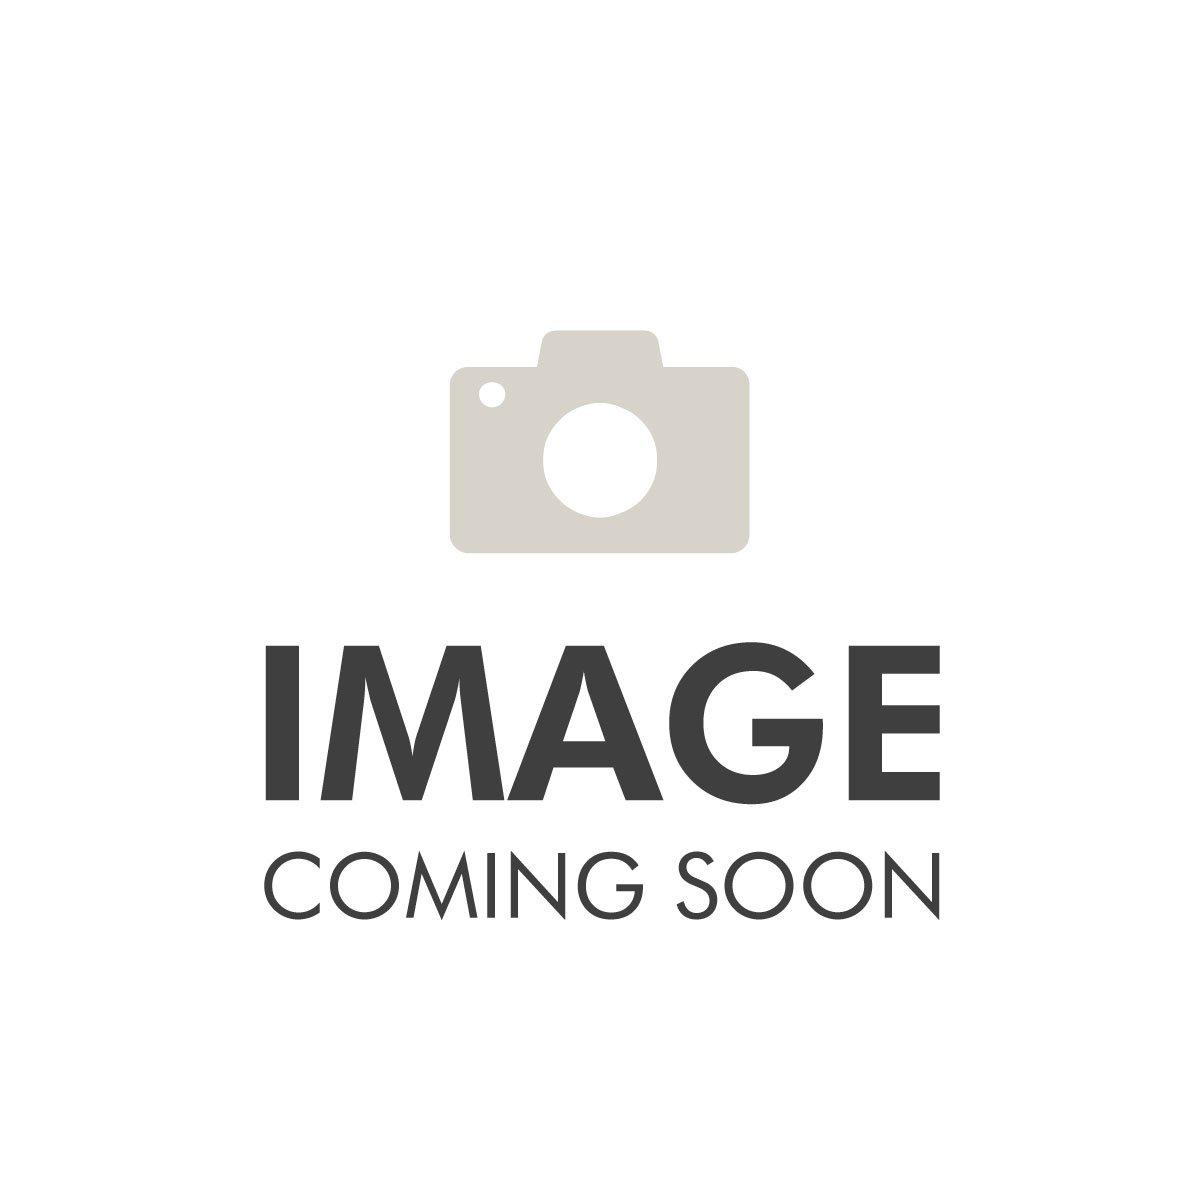 Paco Rabanne Pour Homme EDT Spray 200ml